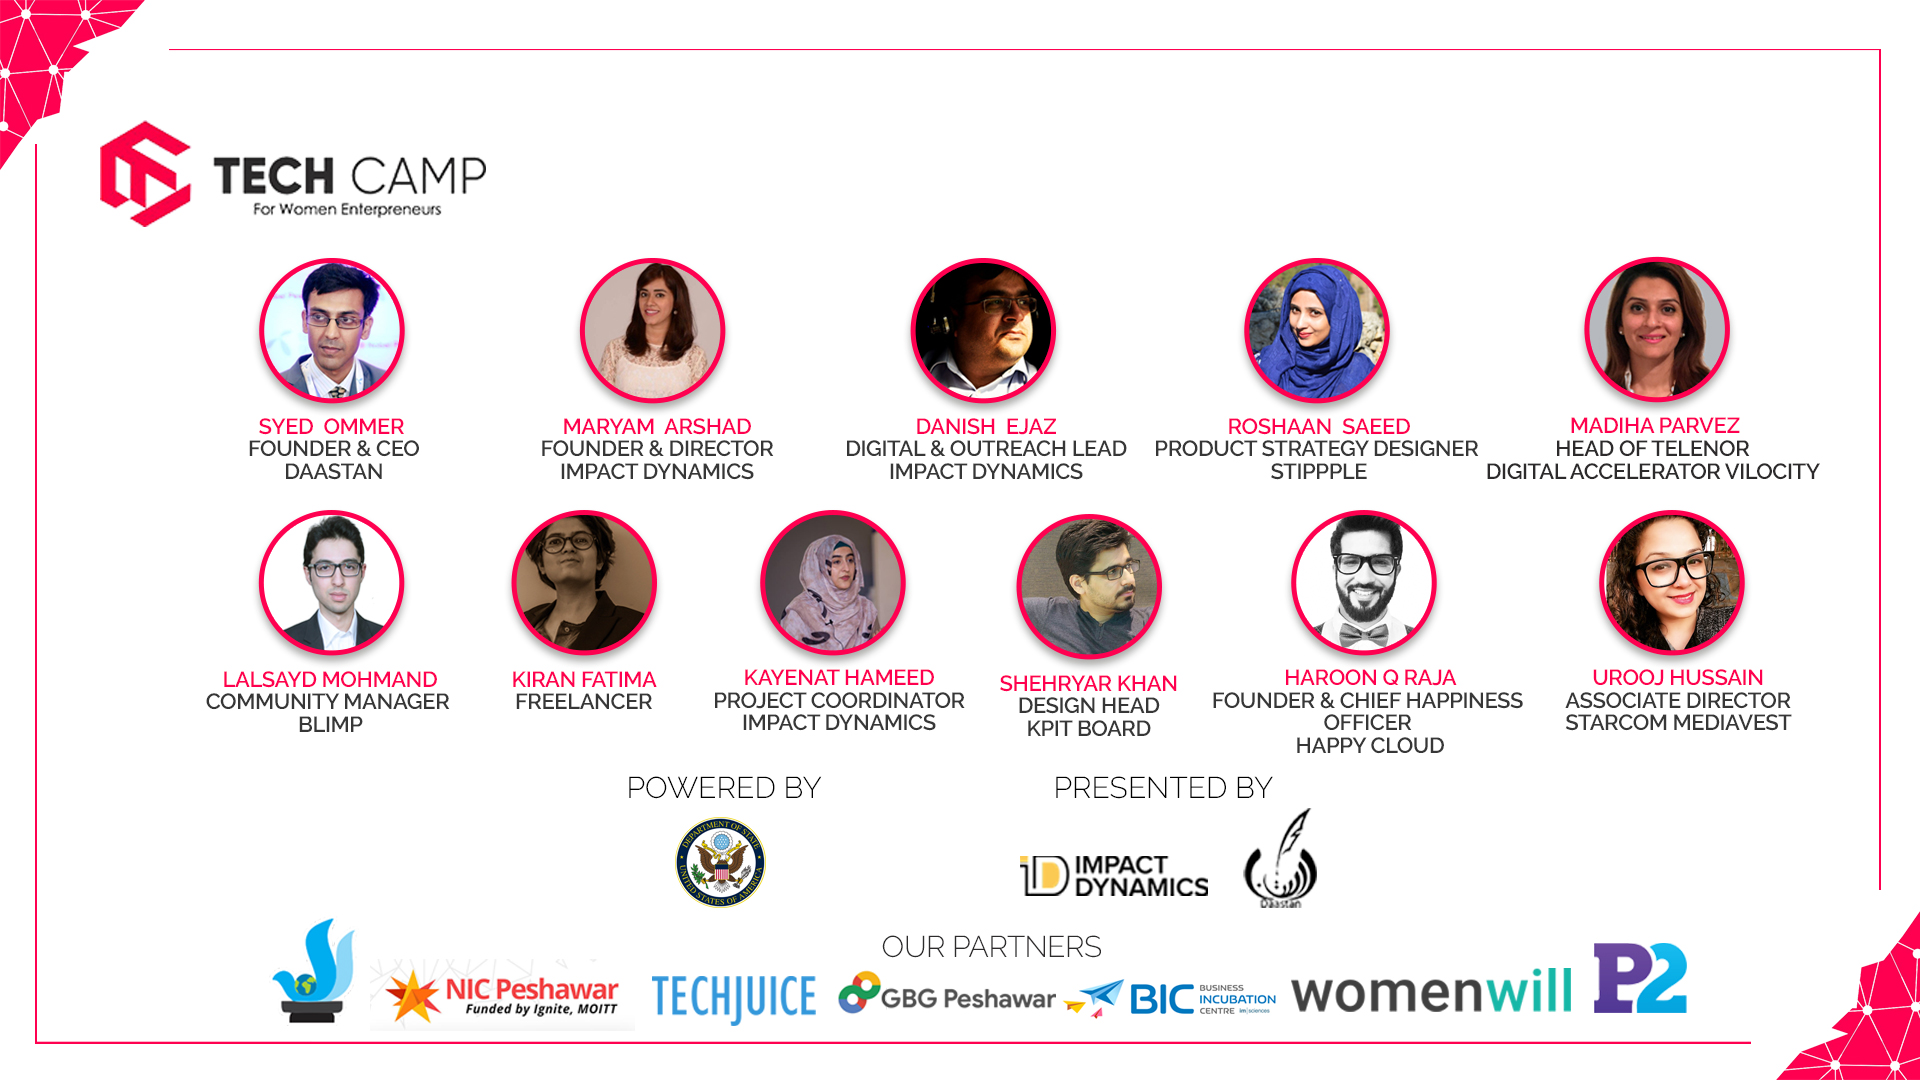 Peshawar's first ever Tech Camp for Women Entrepreneurs is